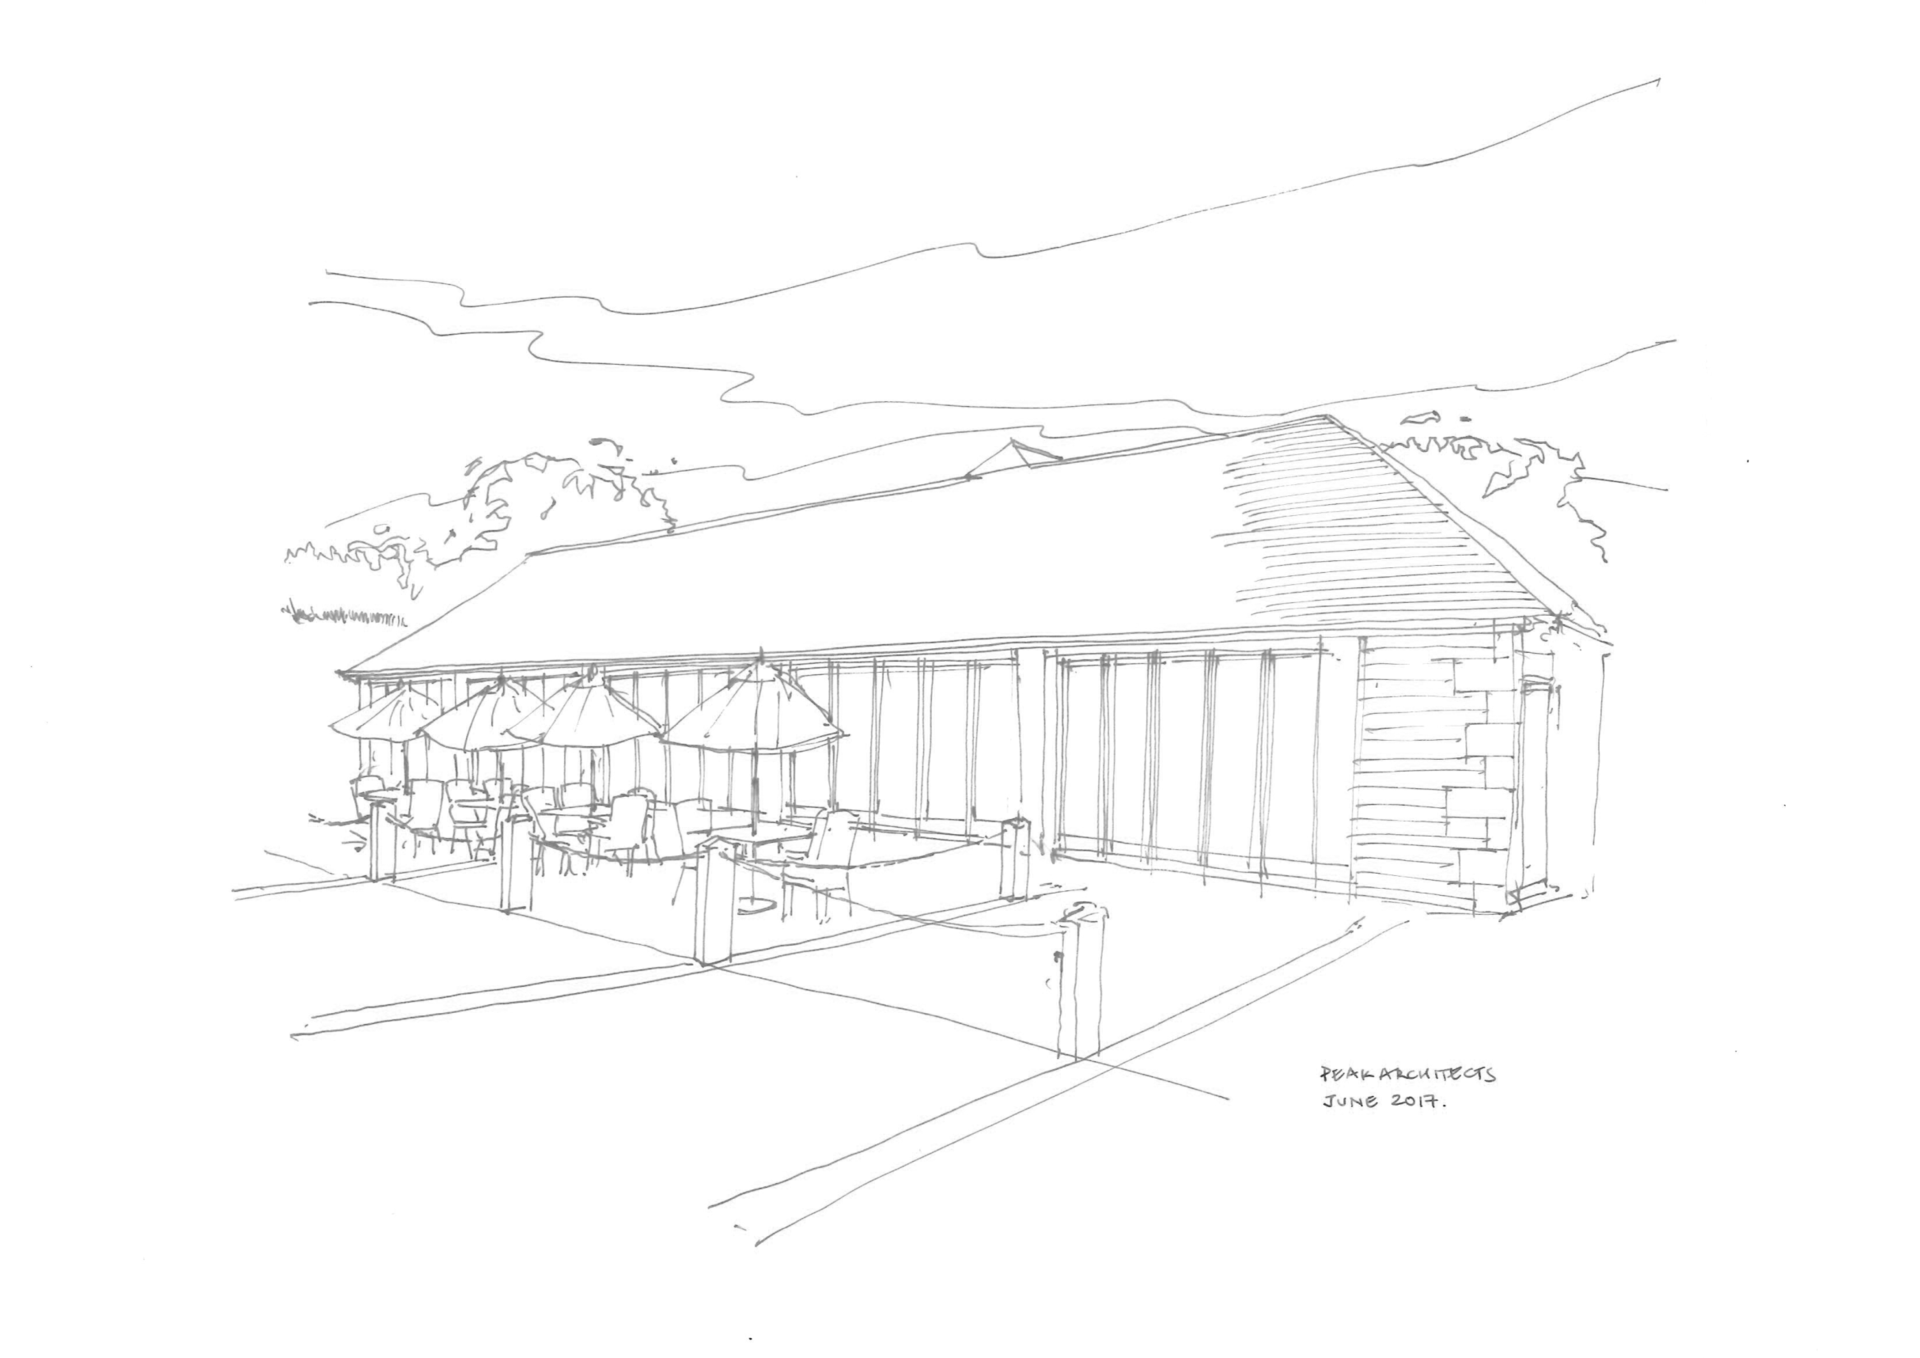 peak architects chatsworth farm shop sketch